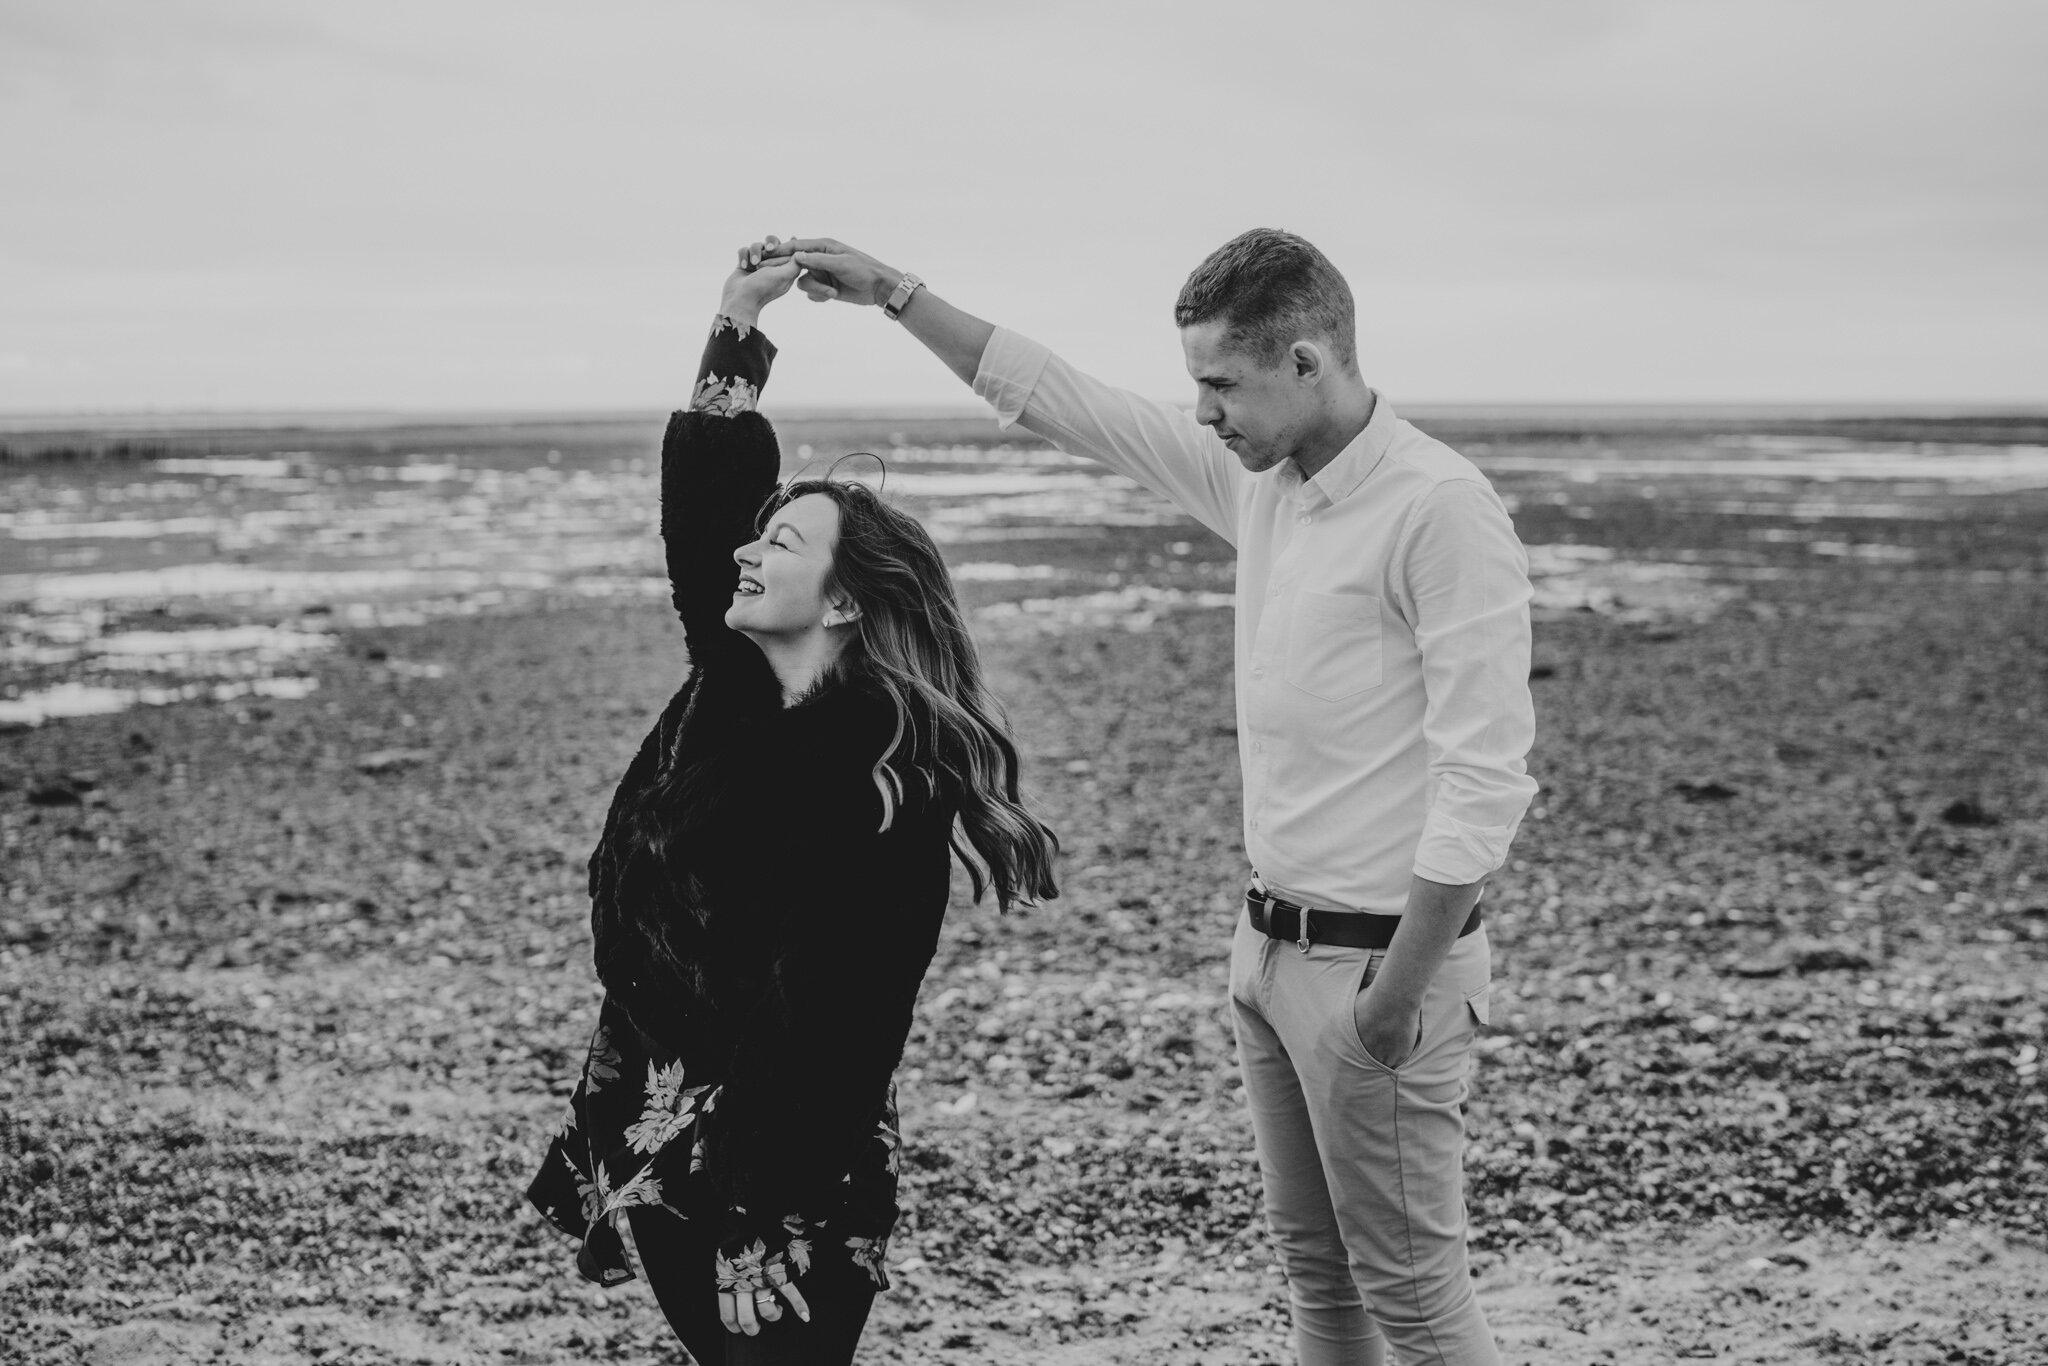 engagement-pre-wedding-hannah-michael-cudmore-grove-east-mersea-grace-elizabeth-colchester-essex-devon-suffolk-and-norfolk-alternative-wedding-and-family-photographer (40 of 51).jpg